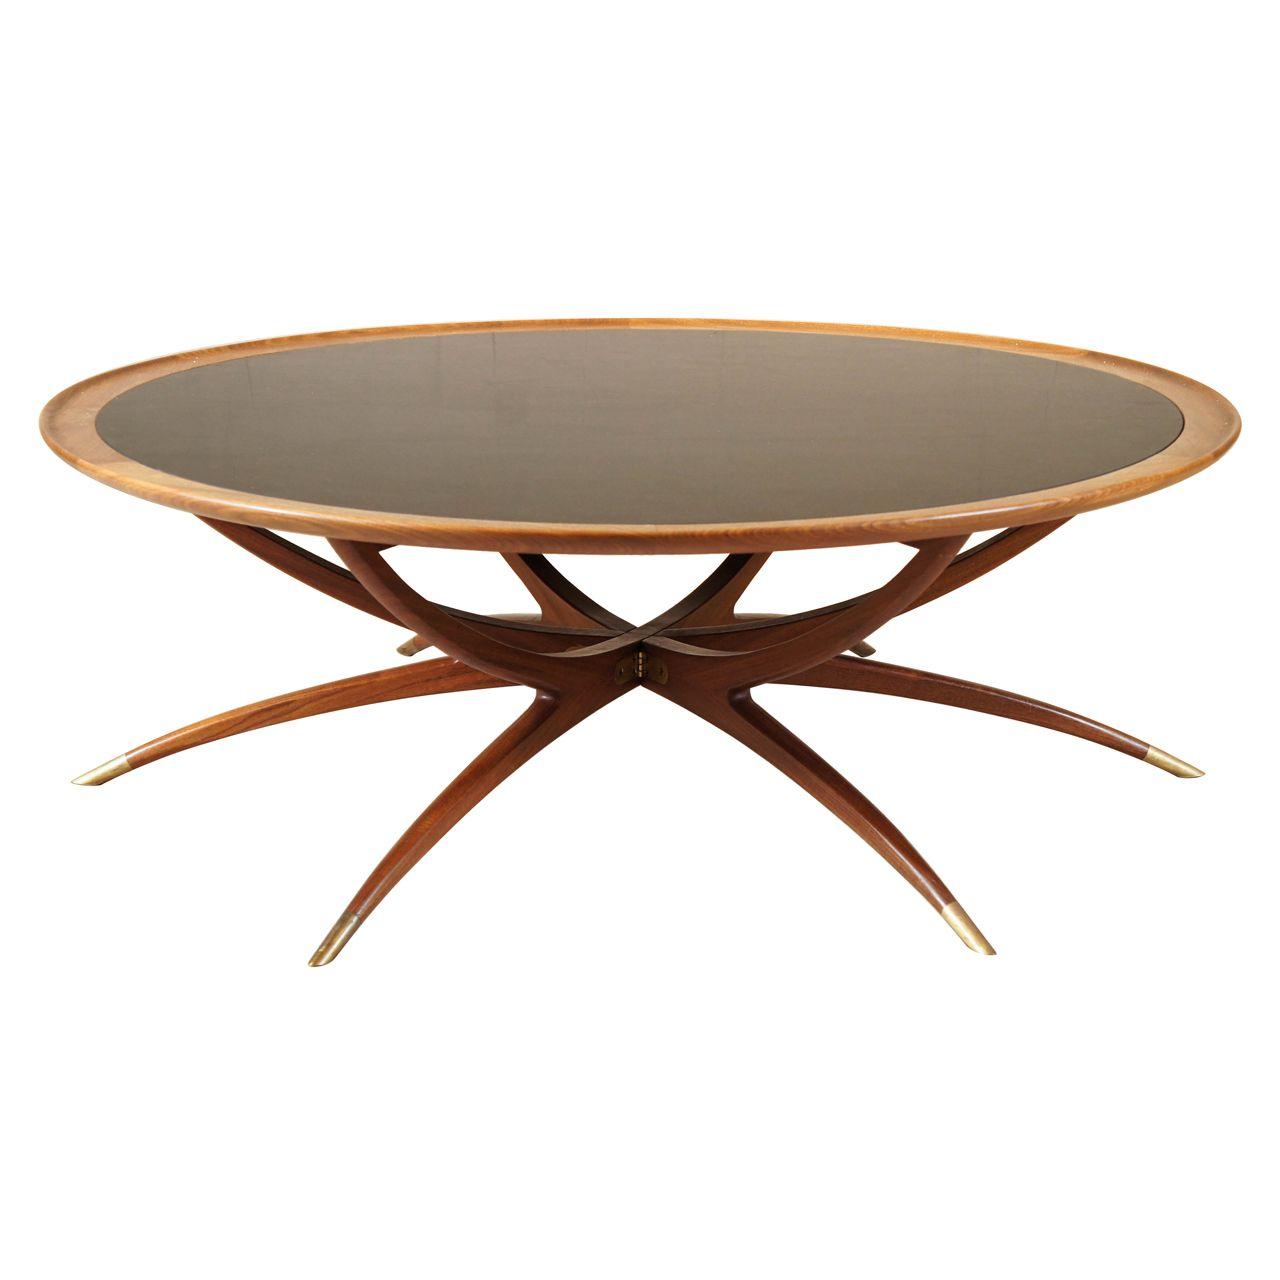 Danish Modern Spider Leg Coffee Table Mid Century Modern Coffee Table Coffee Table Table [ 1280 x 1280 Pixel ]